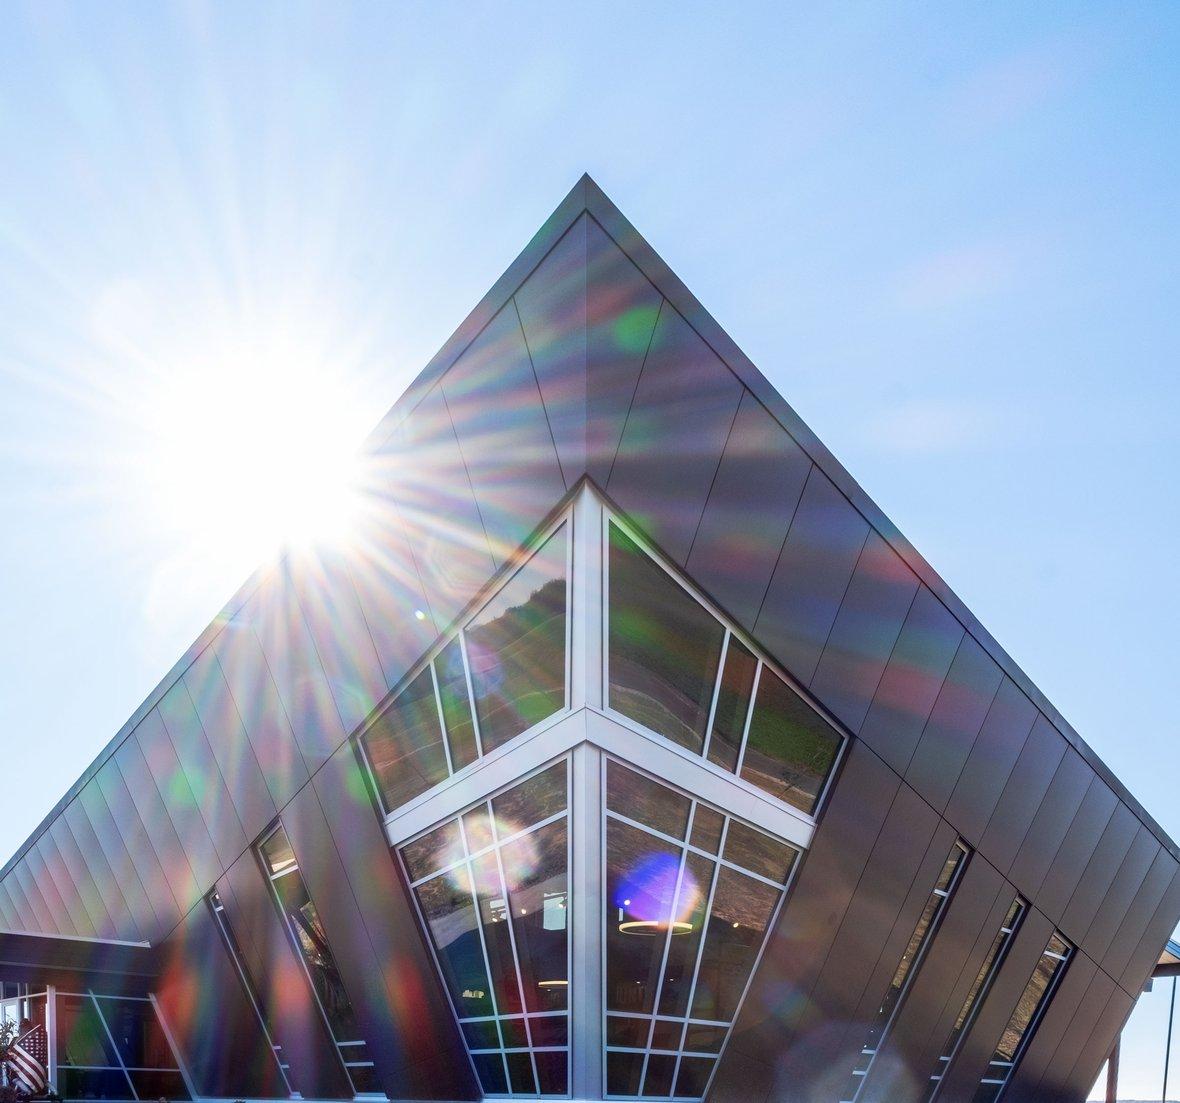 Johnsonville-Marketplace-Retail-Shop-Modern-Exterior-Facade-&-Interior-Design-Green-Build-by-CD-Smith-Construction-Manager-13